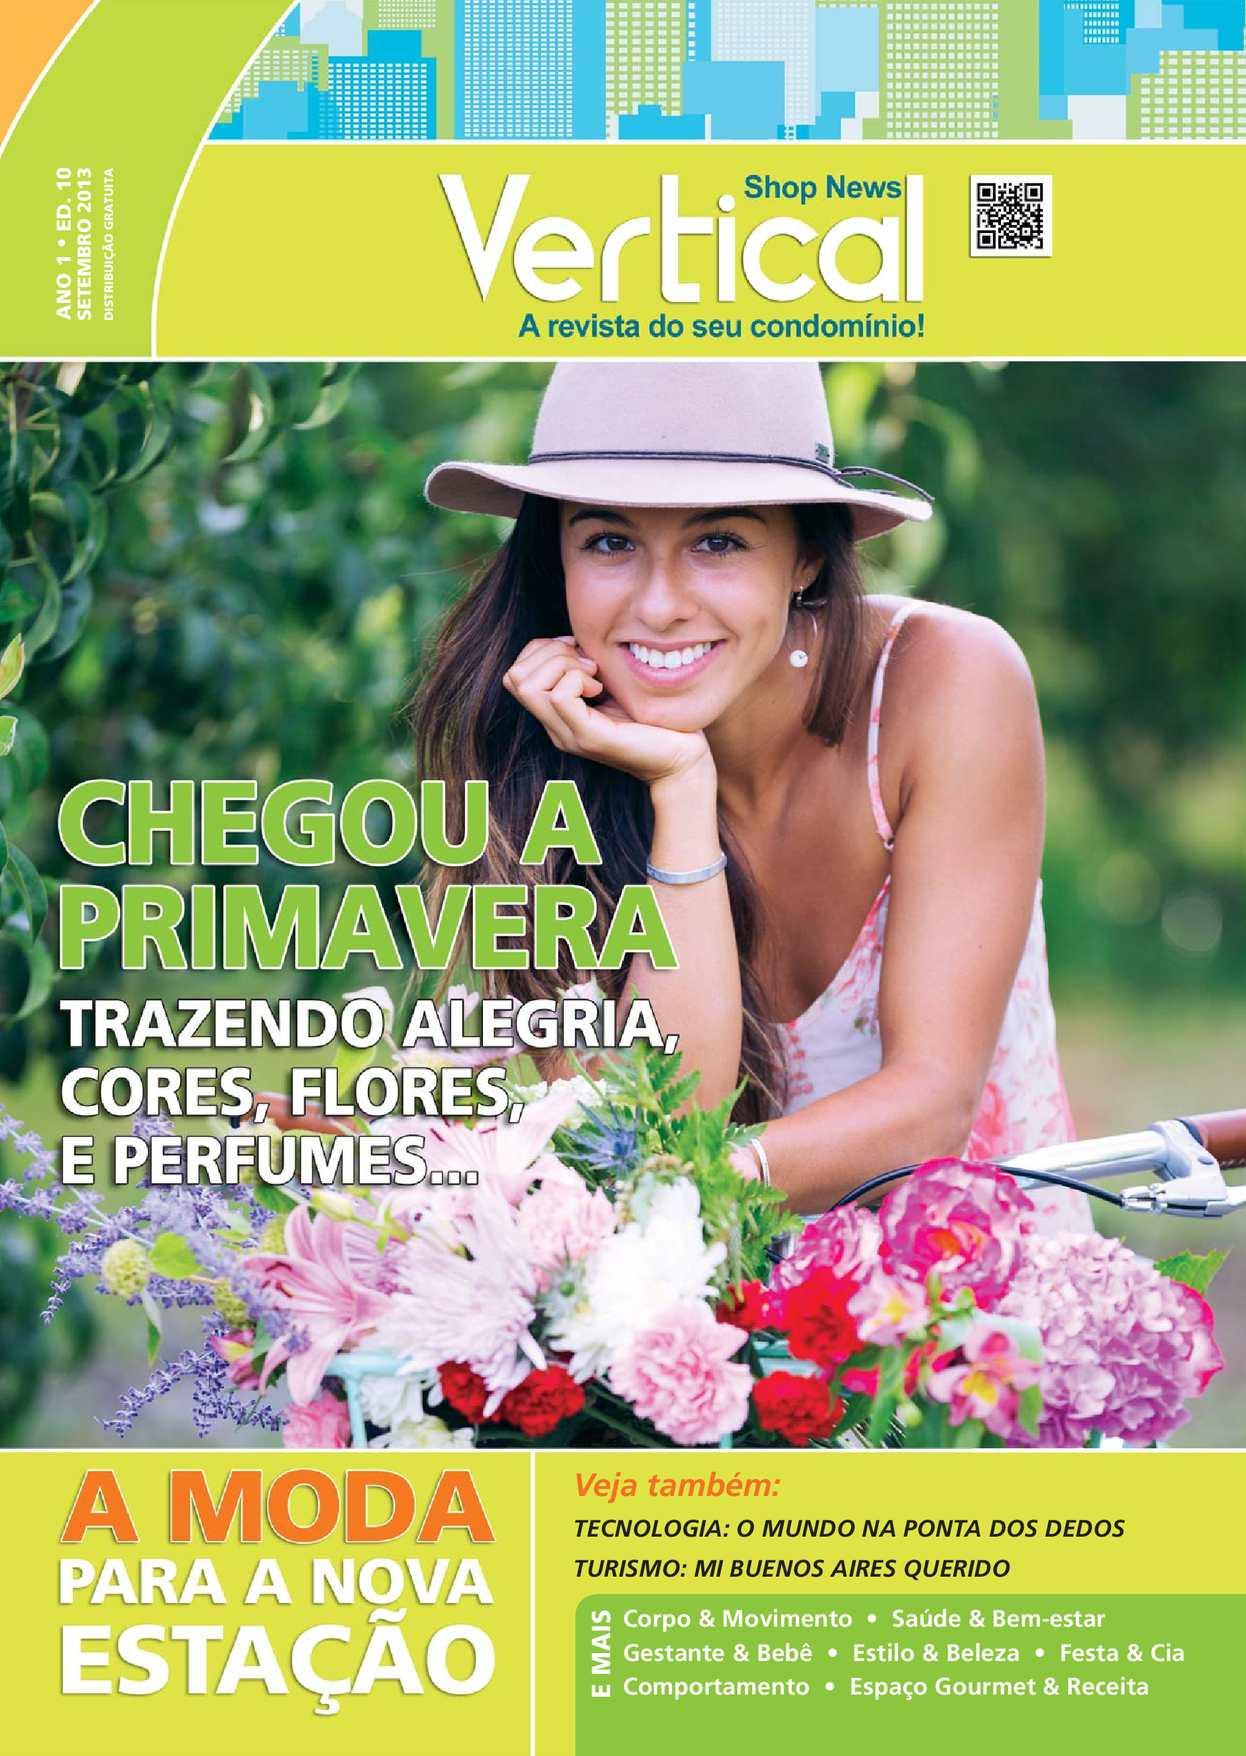 Calaméo - Revista Vertical Ed 10 92ceefb7c50